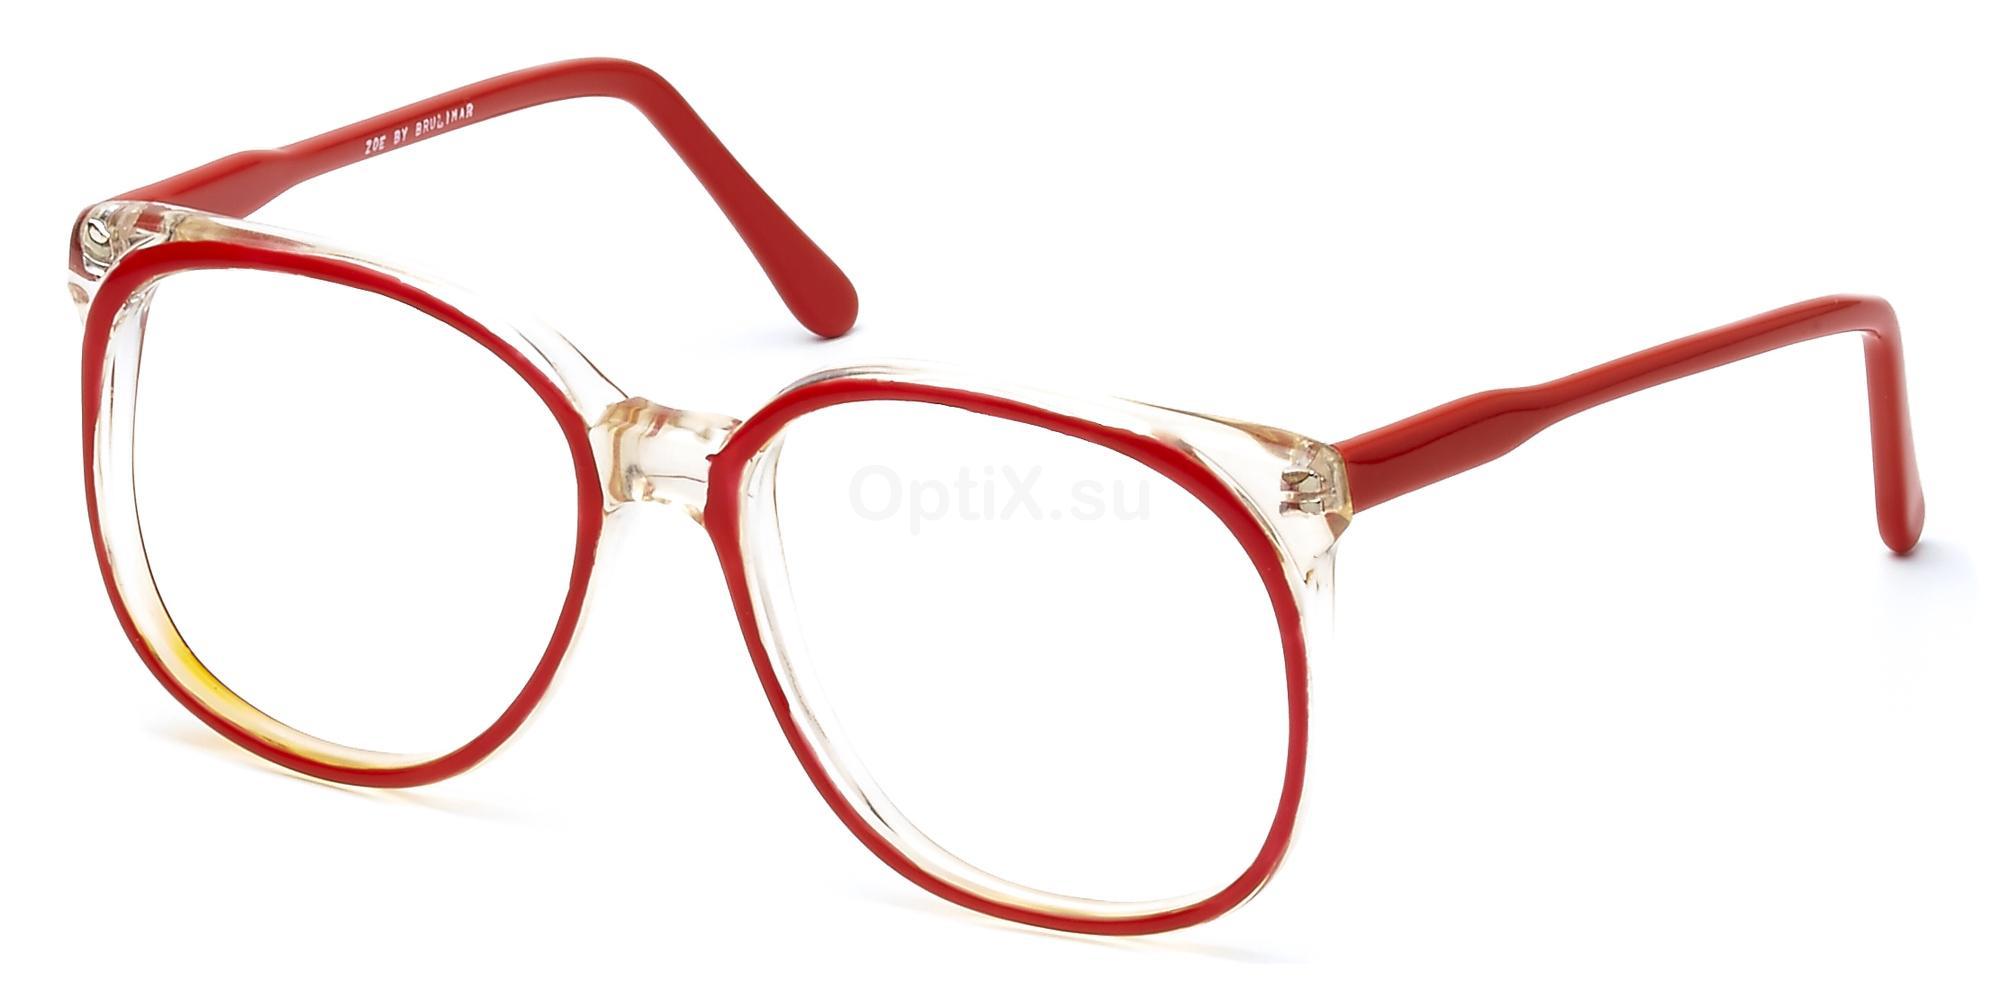 C181 ZOE2181 Glasses, Zoe Vintage